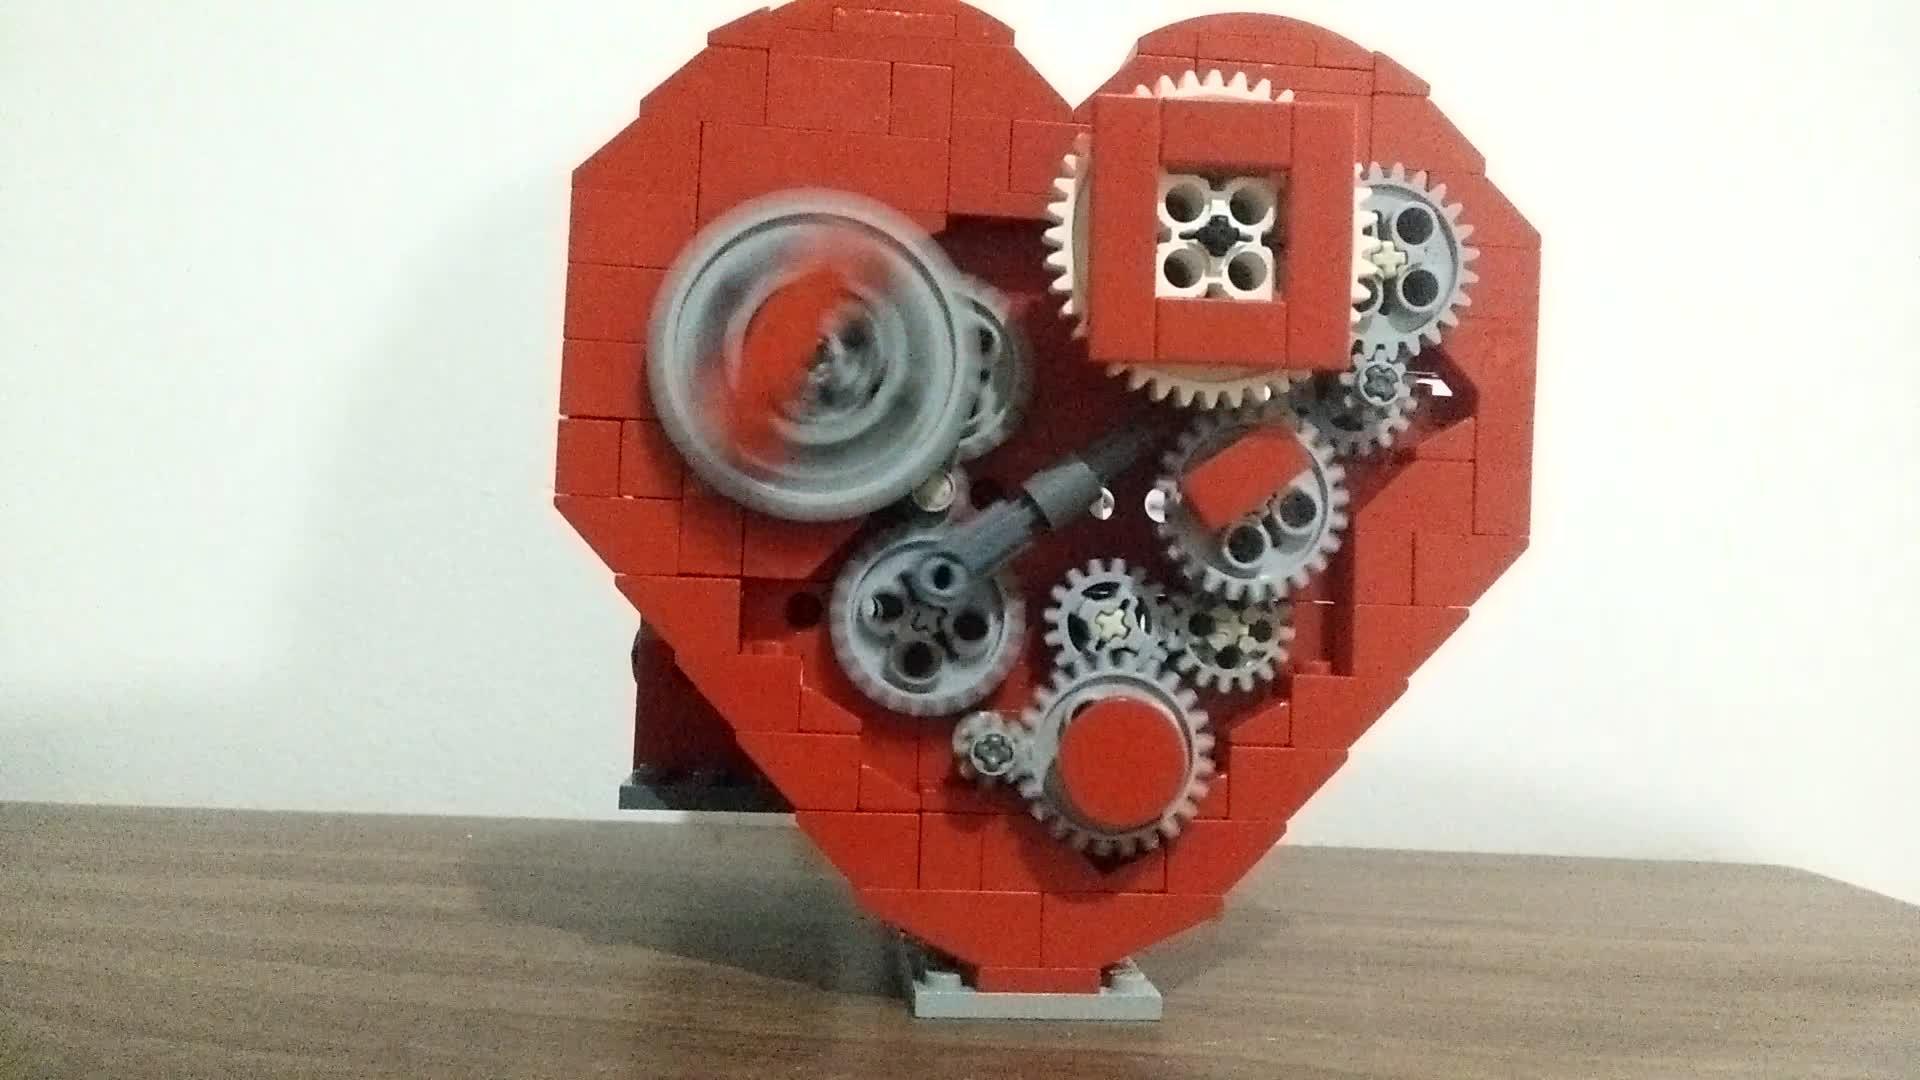 lego, Clockwork Heart GIFs